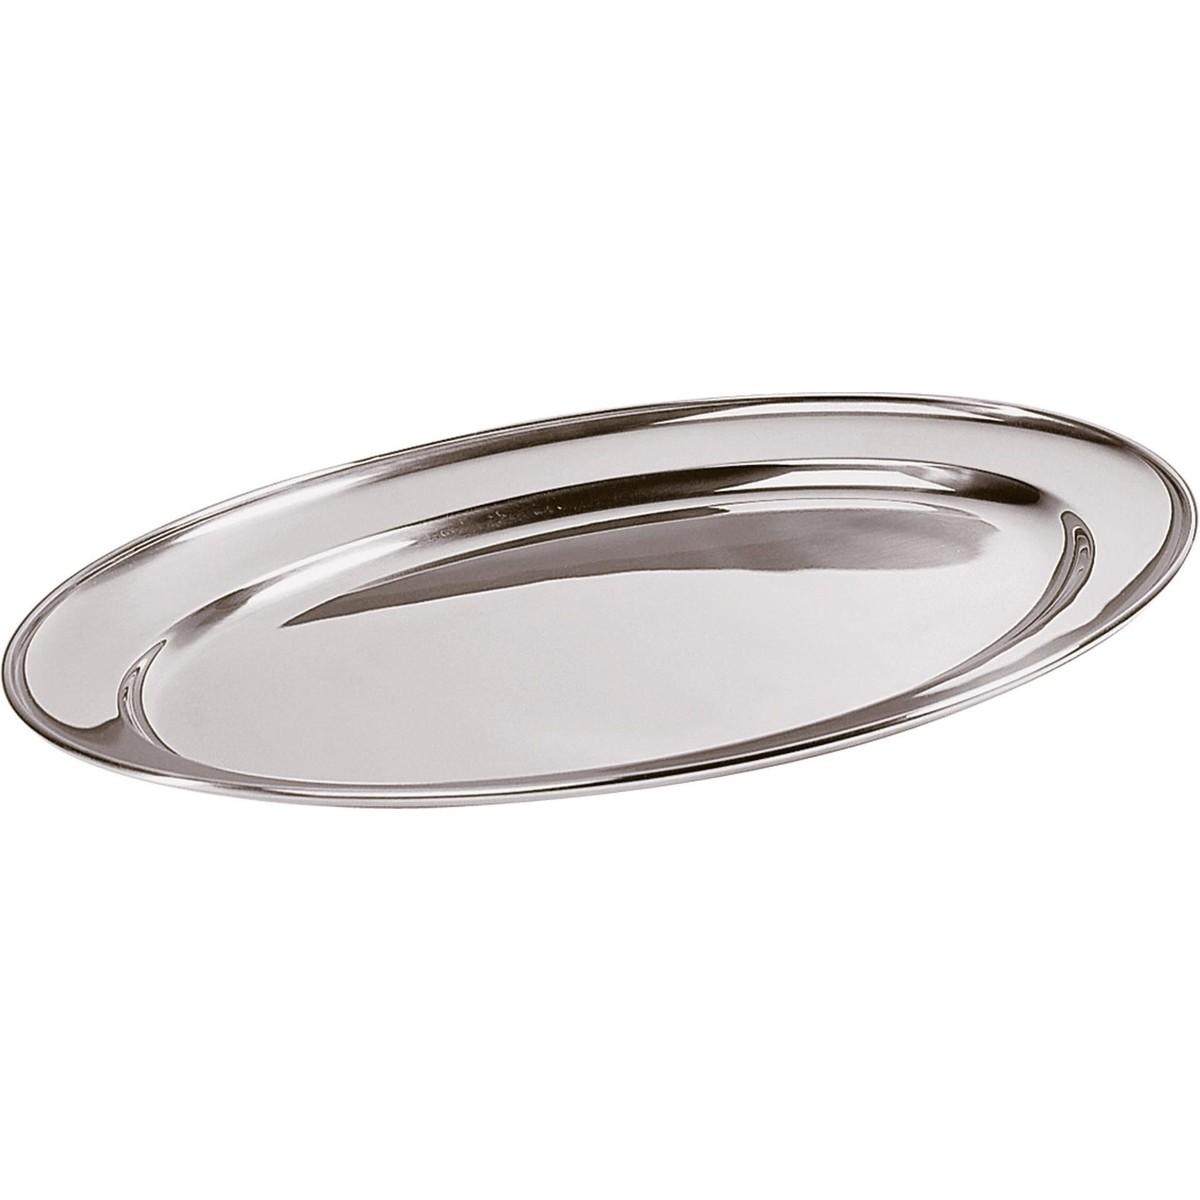 Bratenplatte/Servierplatte oval 25x18cm